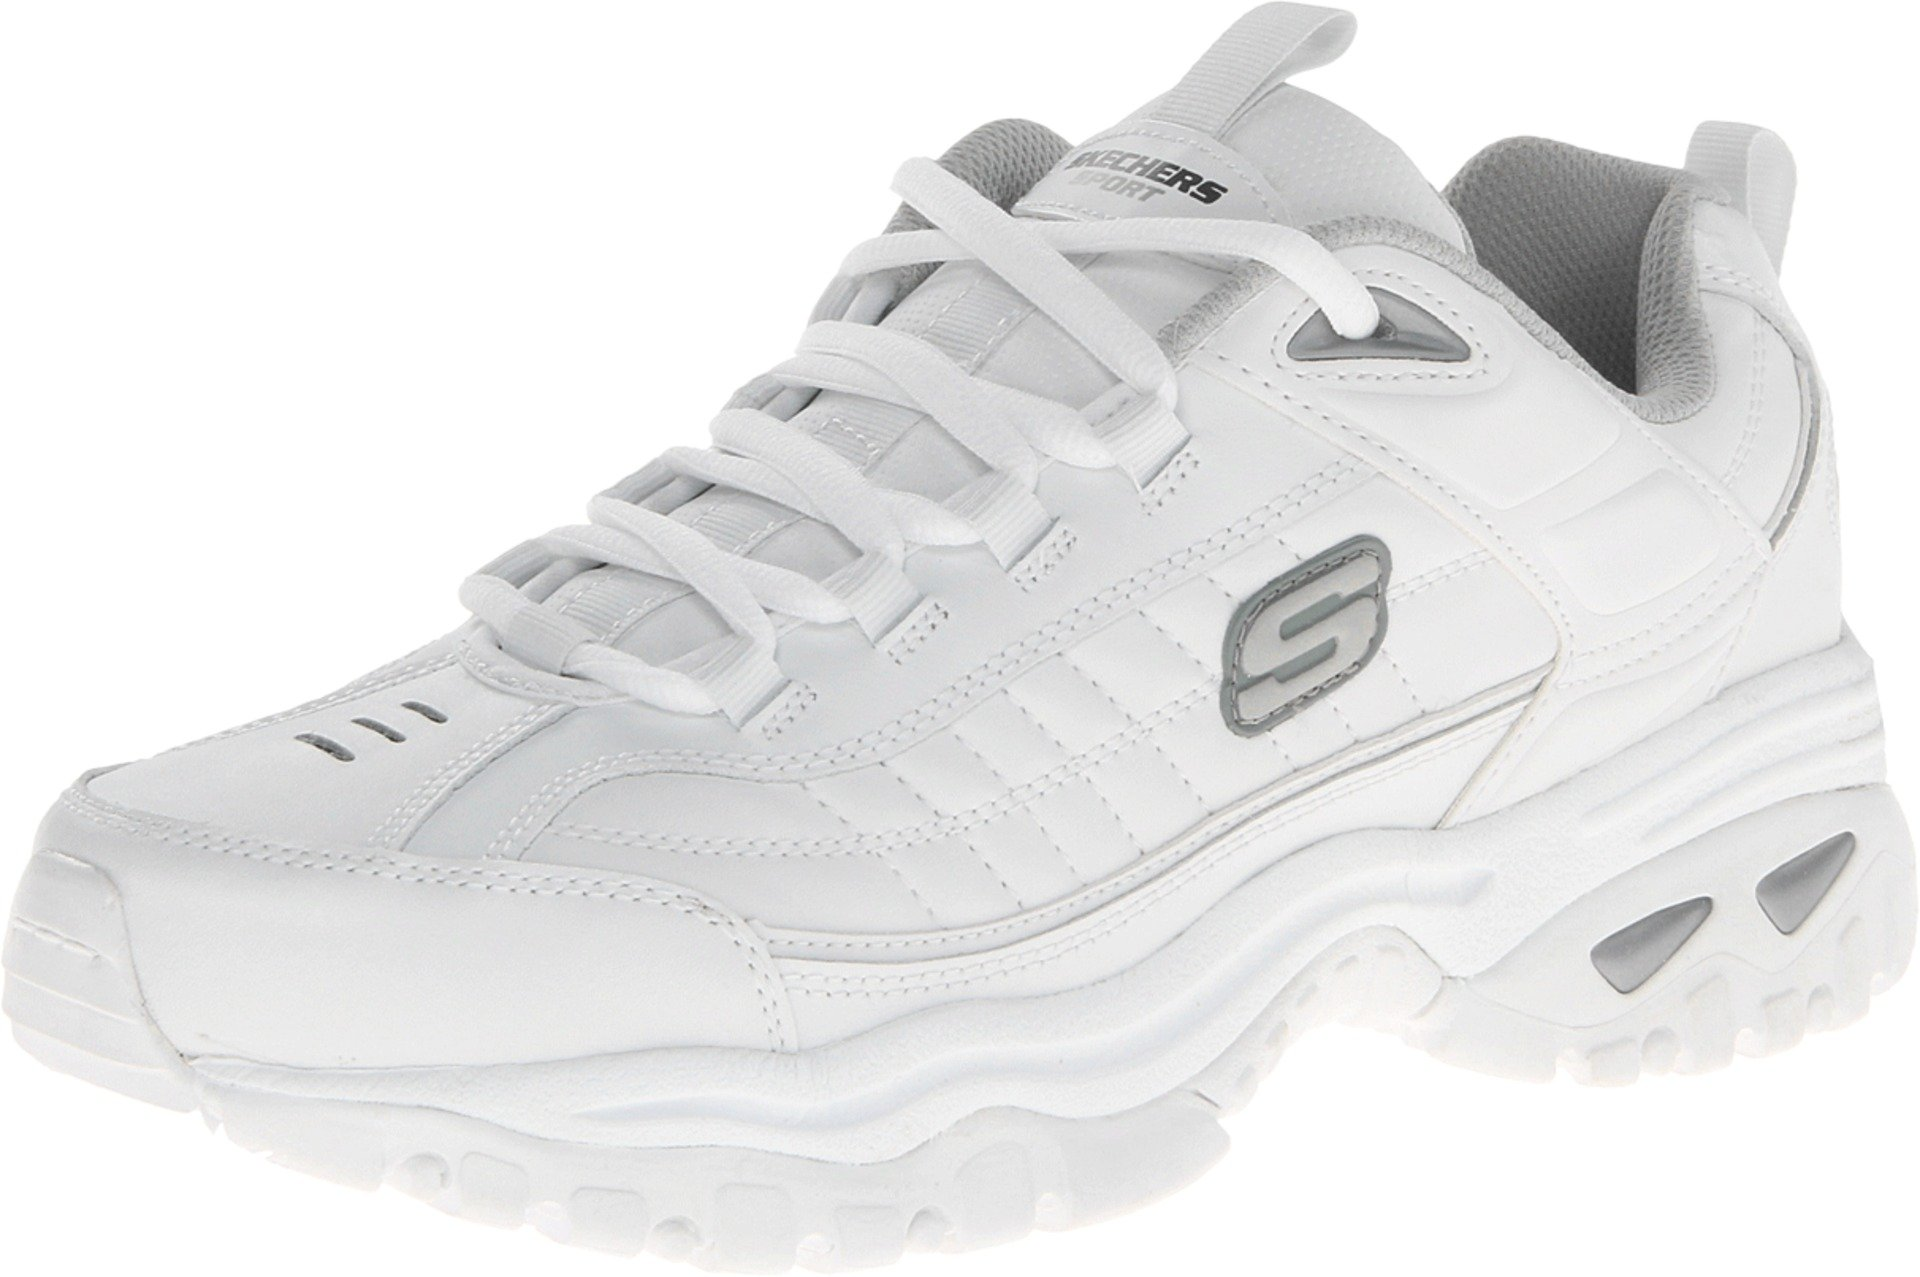 Skechers Men's Energy Afterburn Lace-Up Sneaker,White,10.5 M US